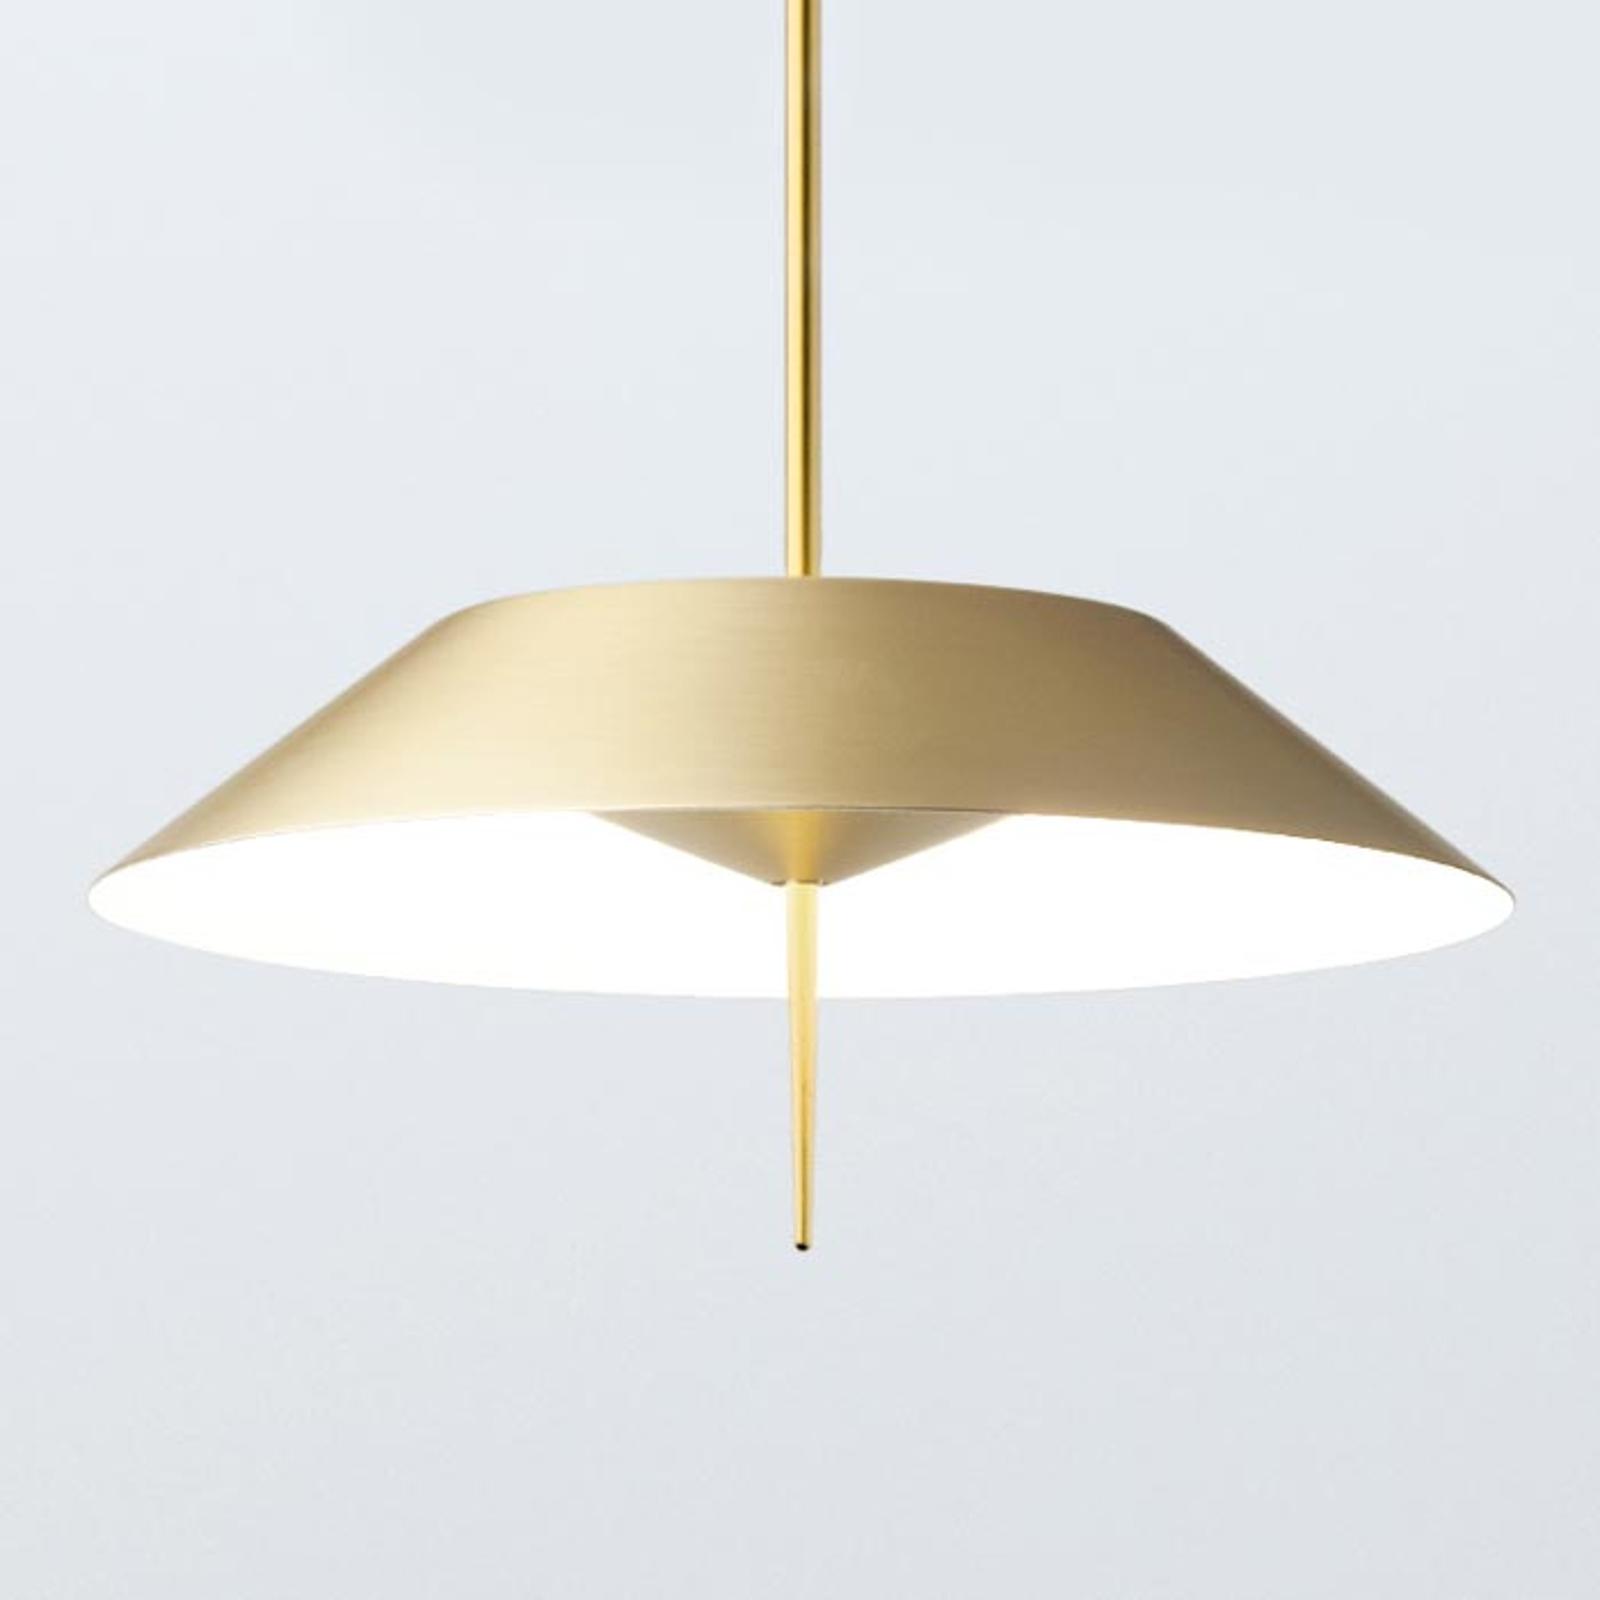 Mayfair - moderna lampada a sospensione LED